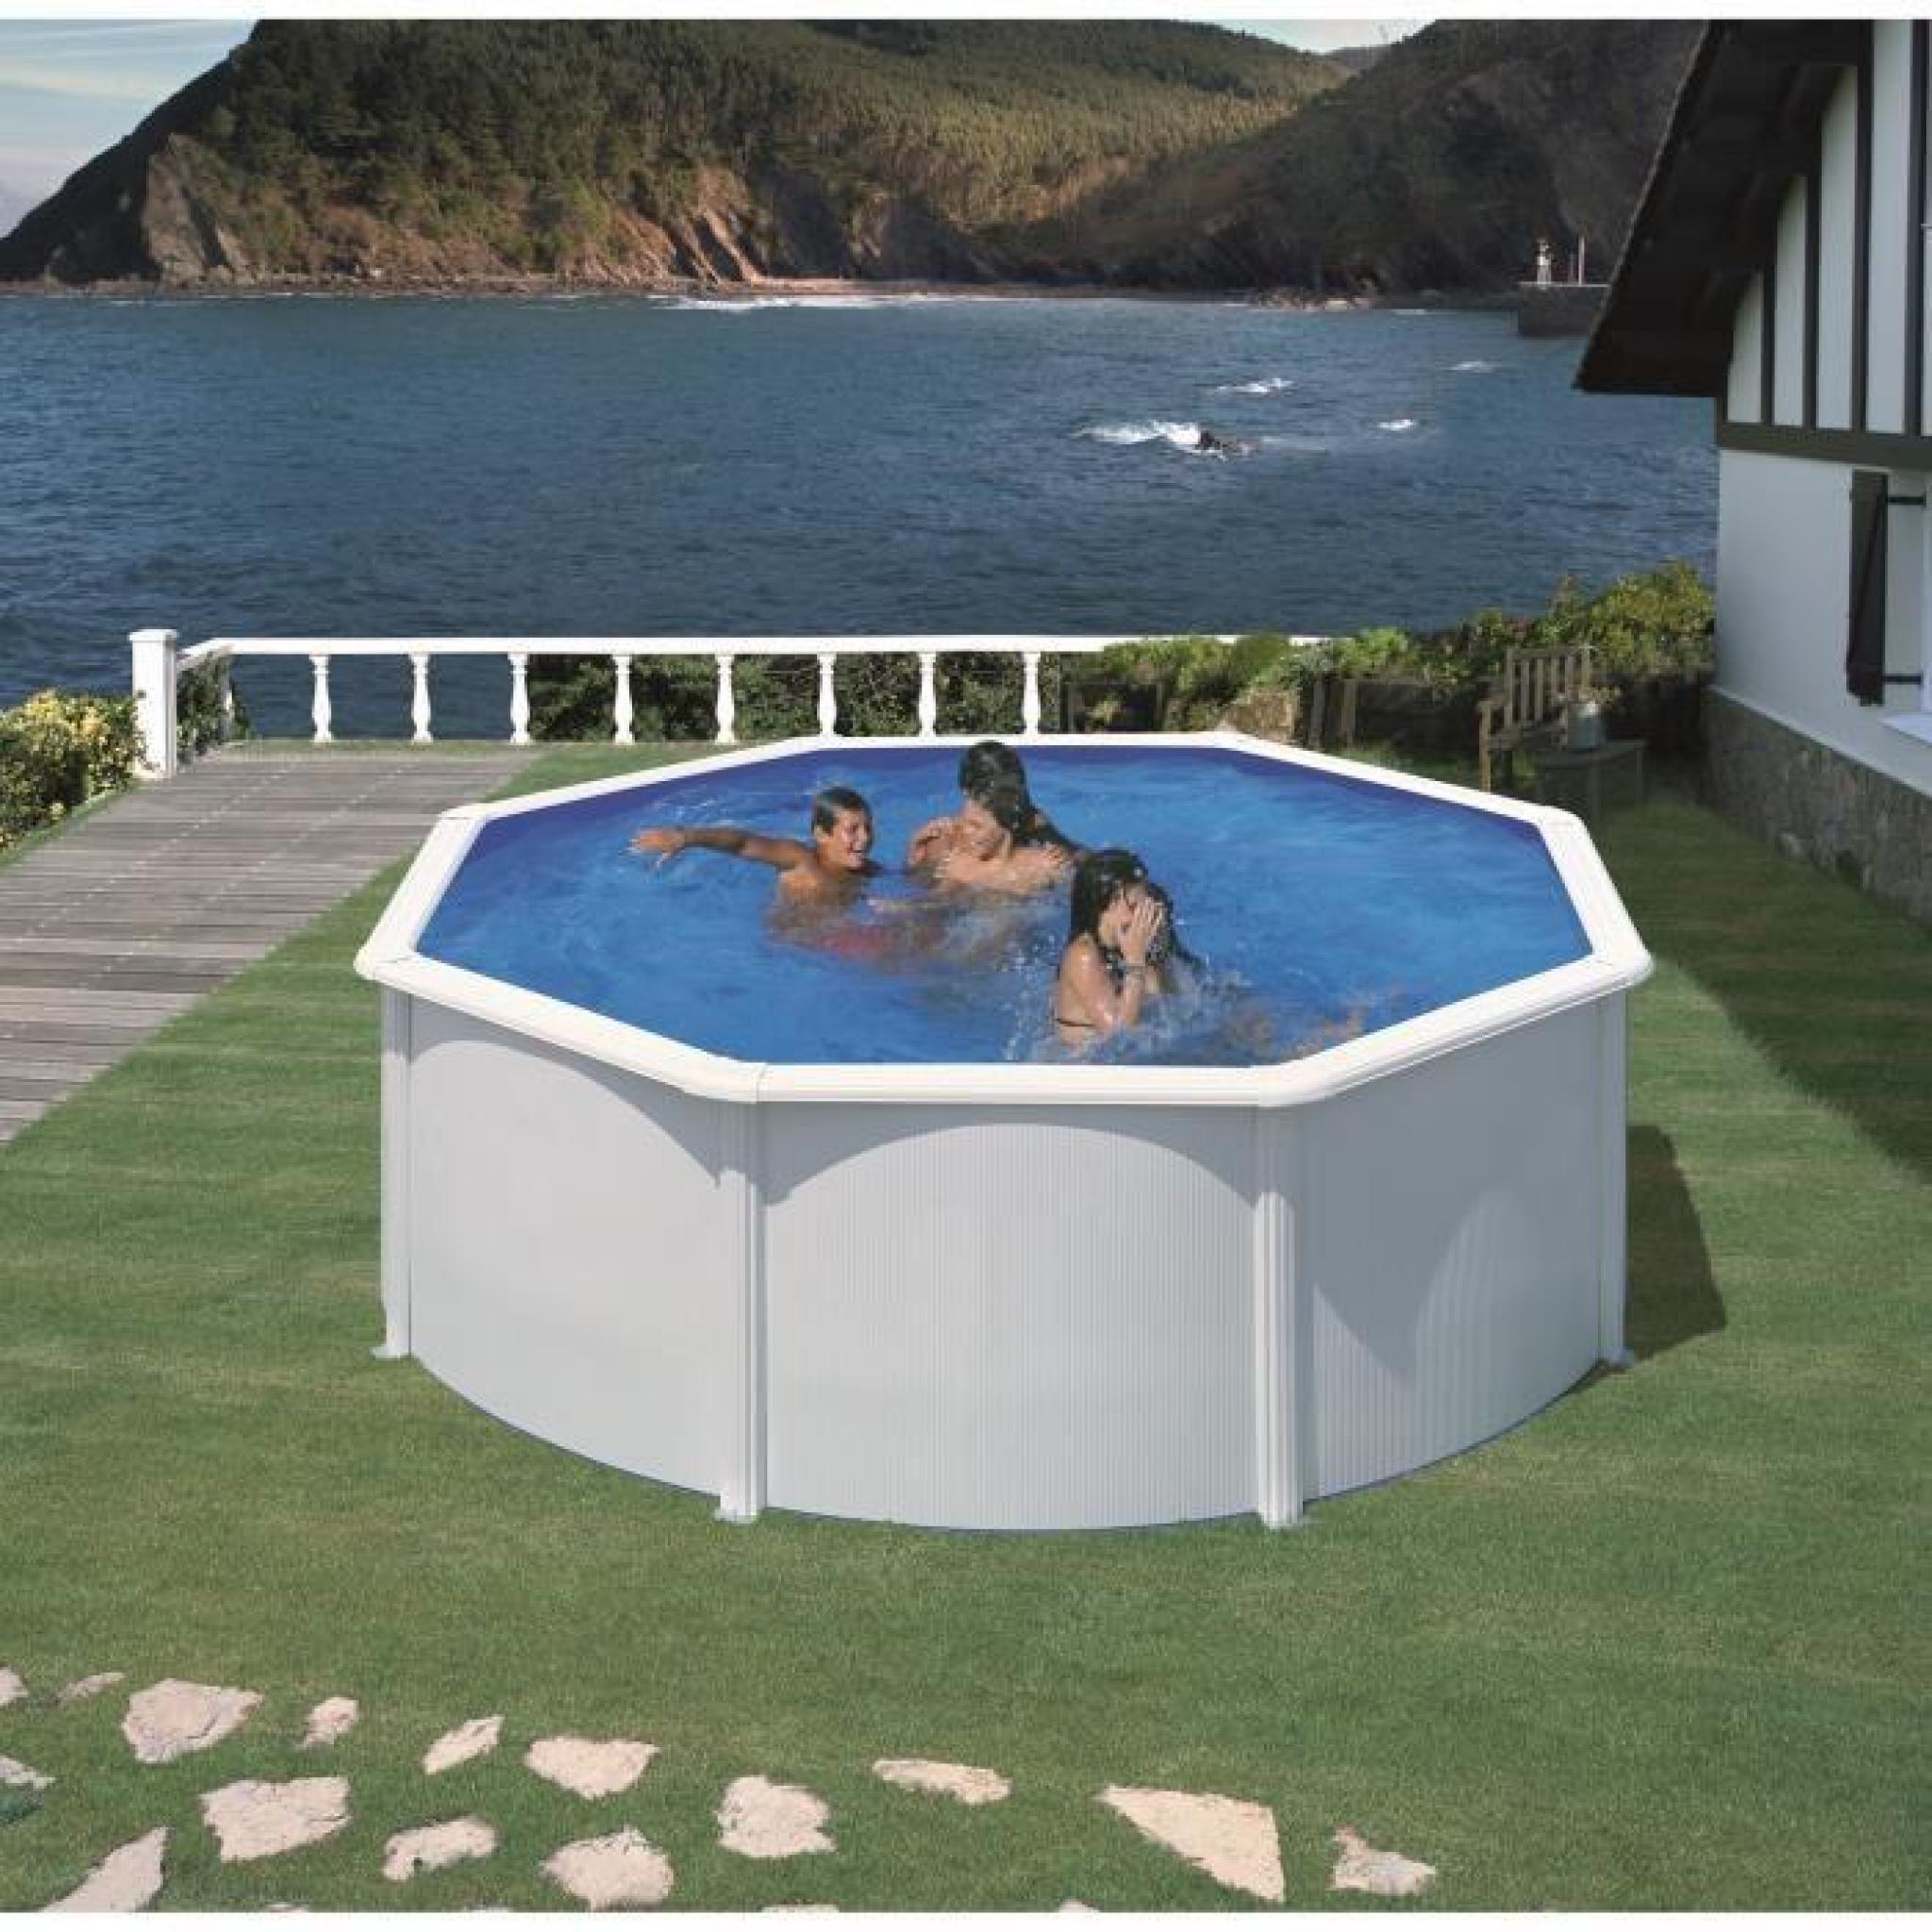 GRE Kit piscine hors-sol ronde en acier Wet Ø8,8x8,8 m - Liner bleu